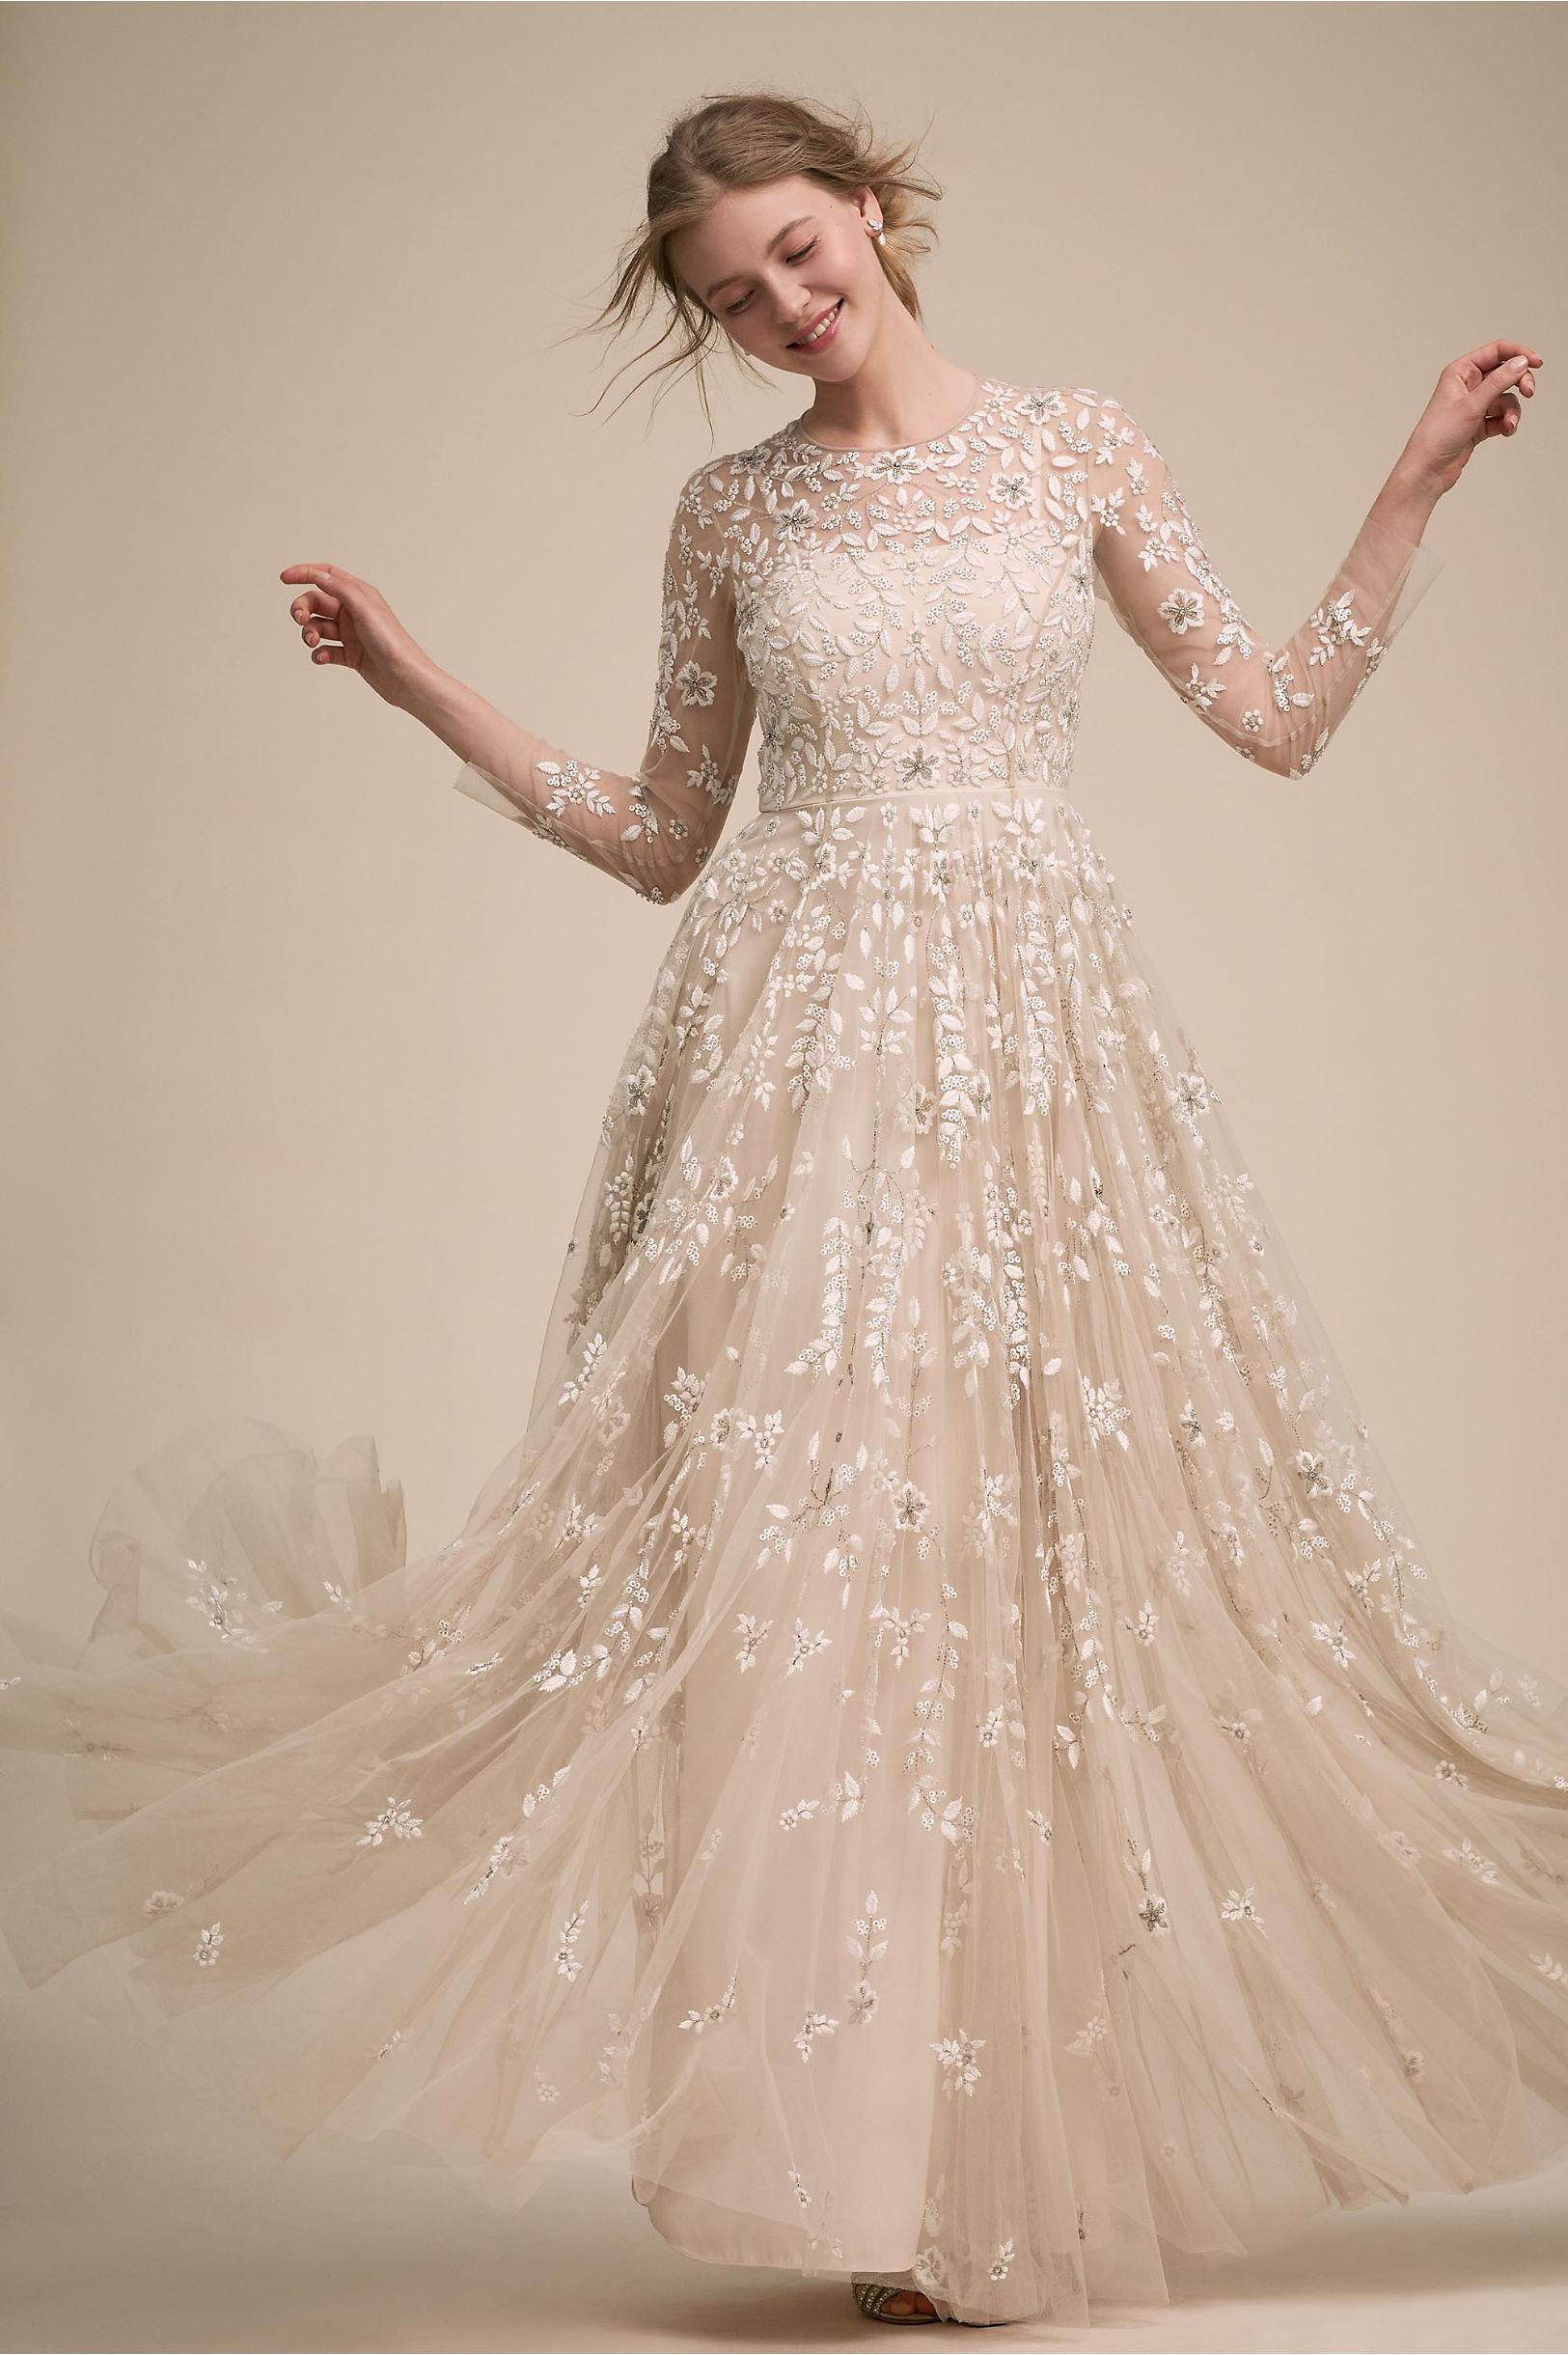 Golden Hour Gown Champagne in Bride | BHLDN